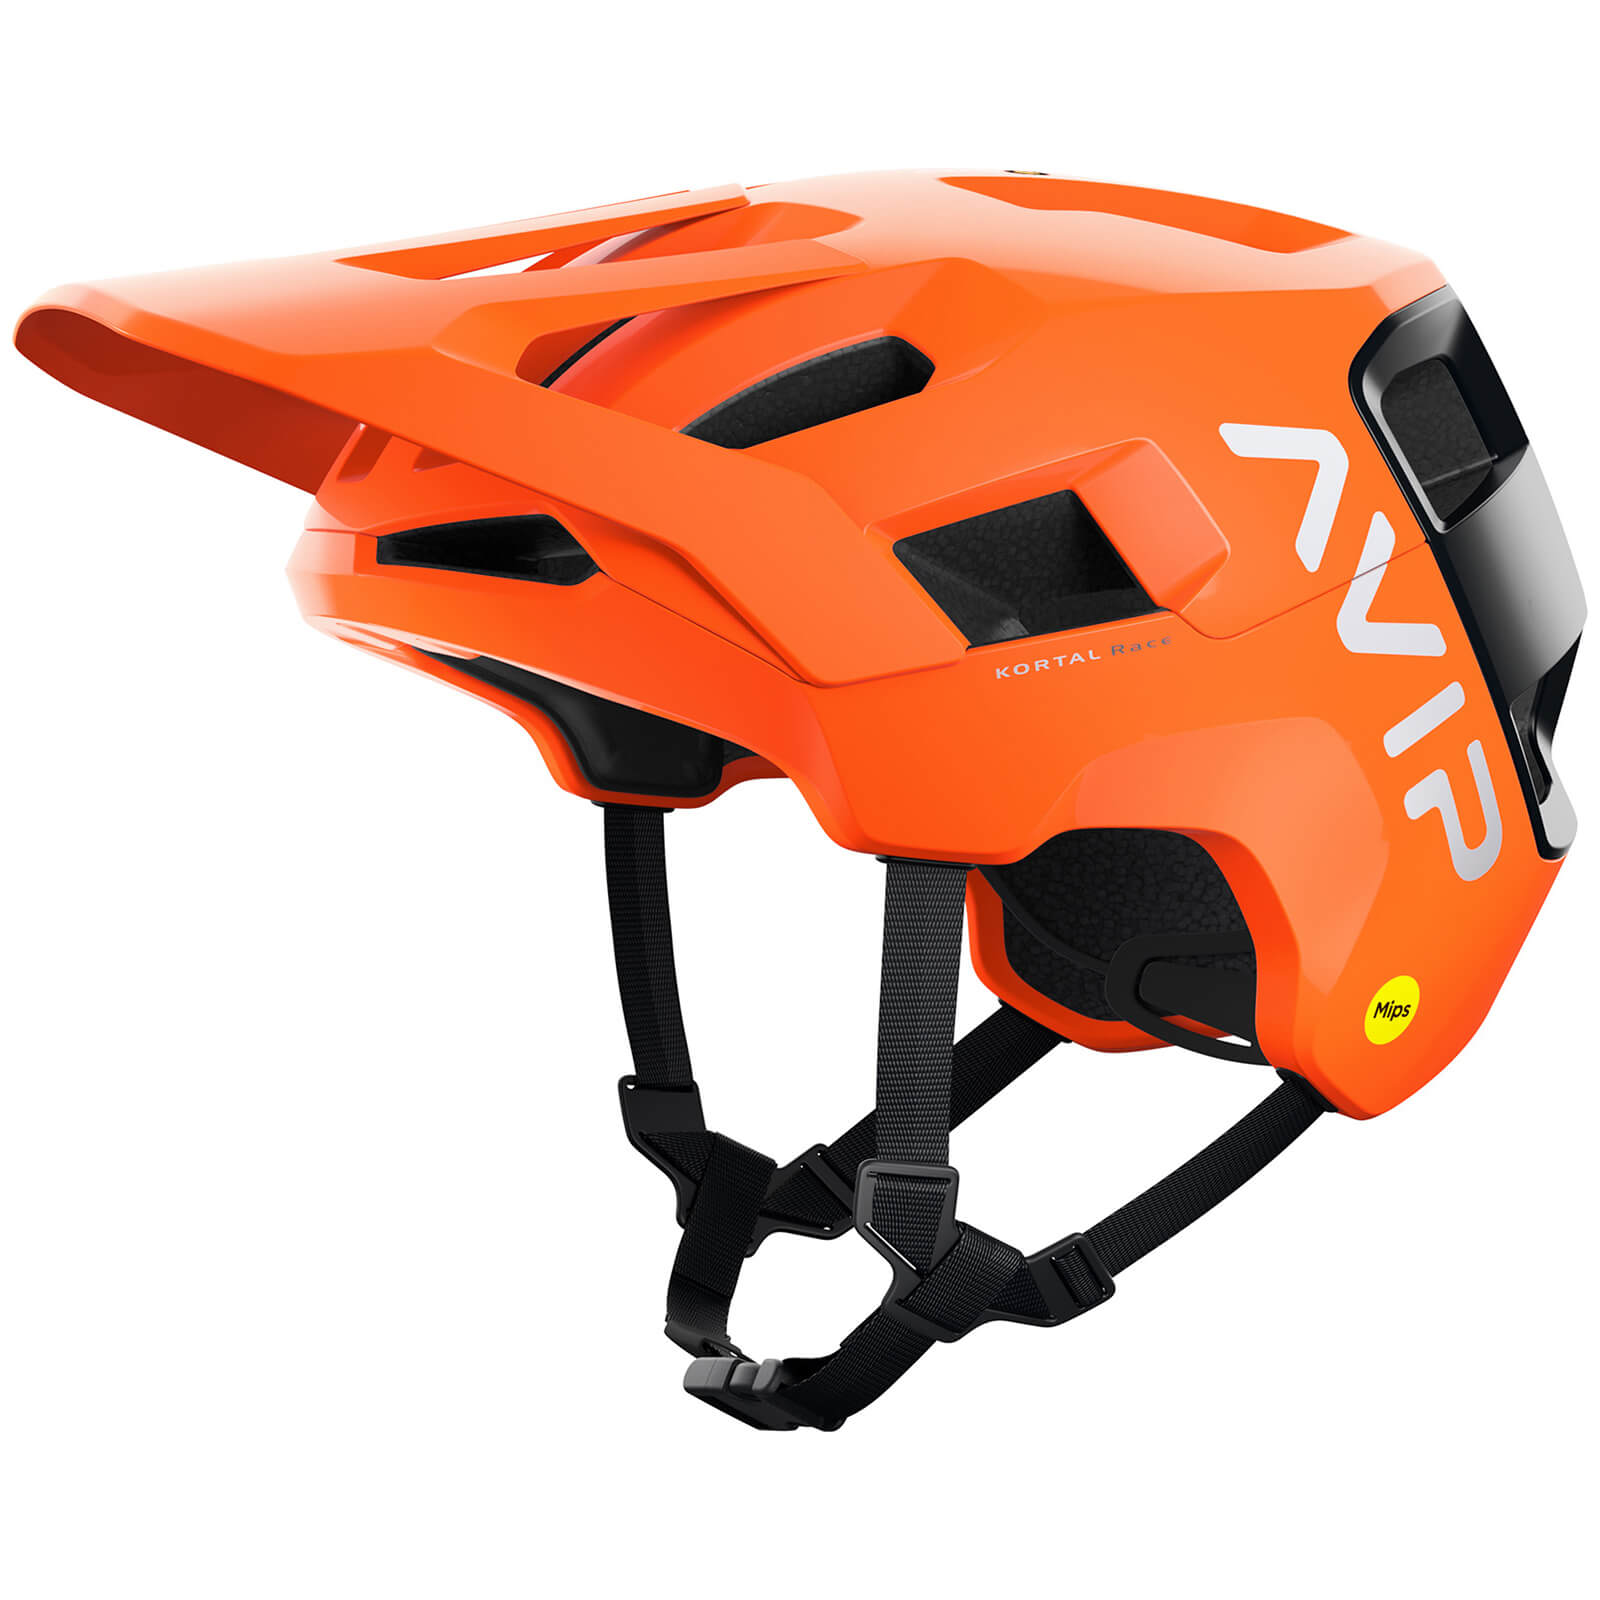 POC Kortal Race MIPS MTB Helmet - XS-S/51cm-54cm - Fluorescent Orange AVIP/Uranium Black Matt